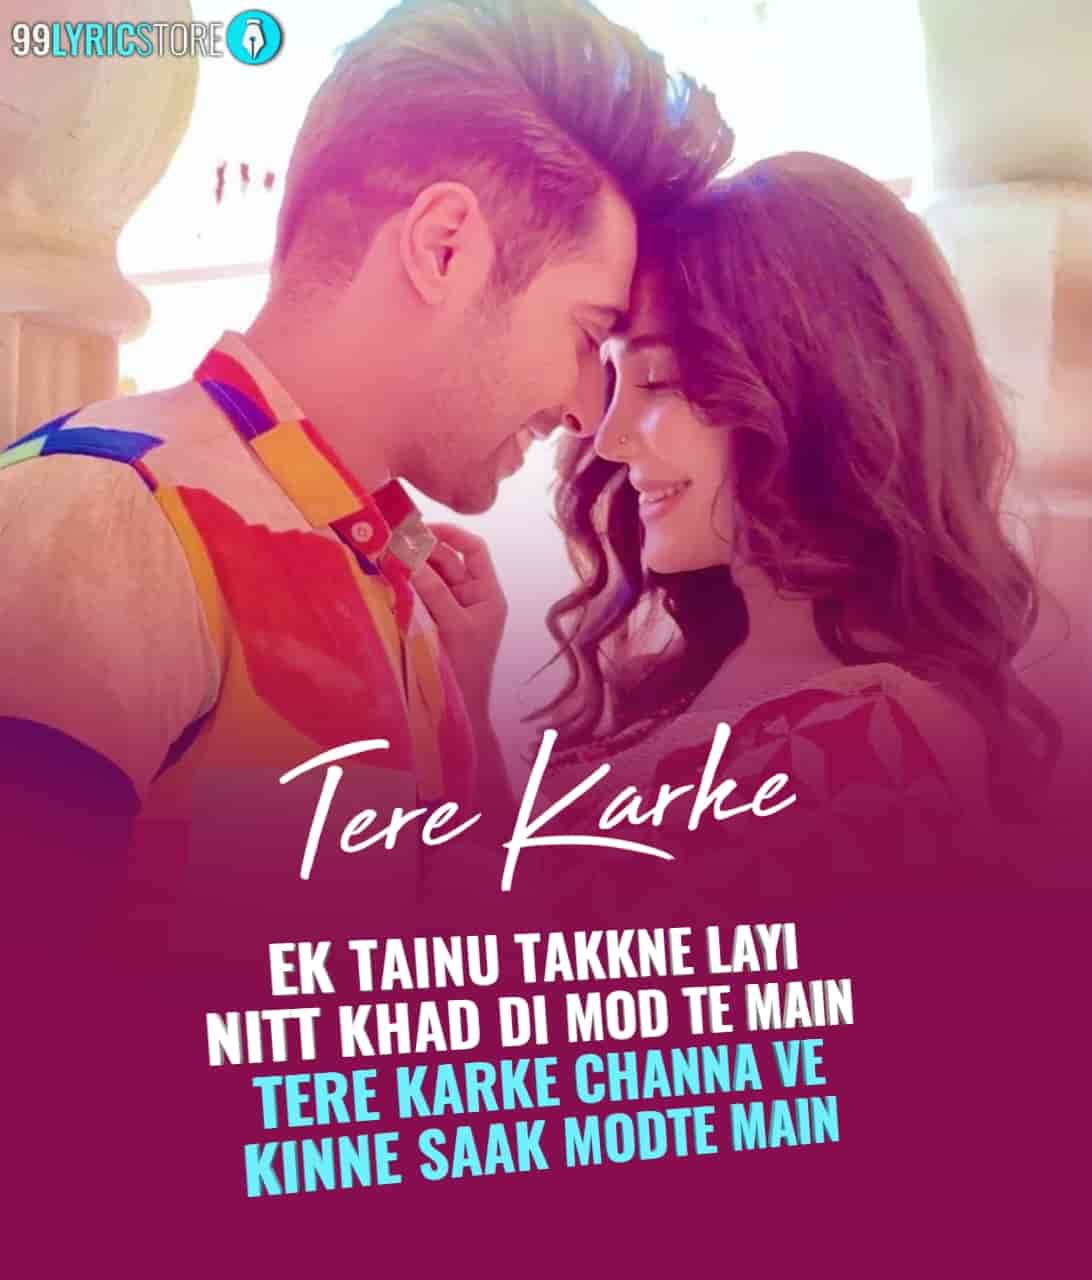 Tere Karke Song Image By Guri